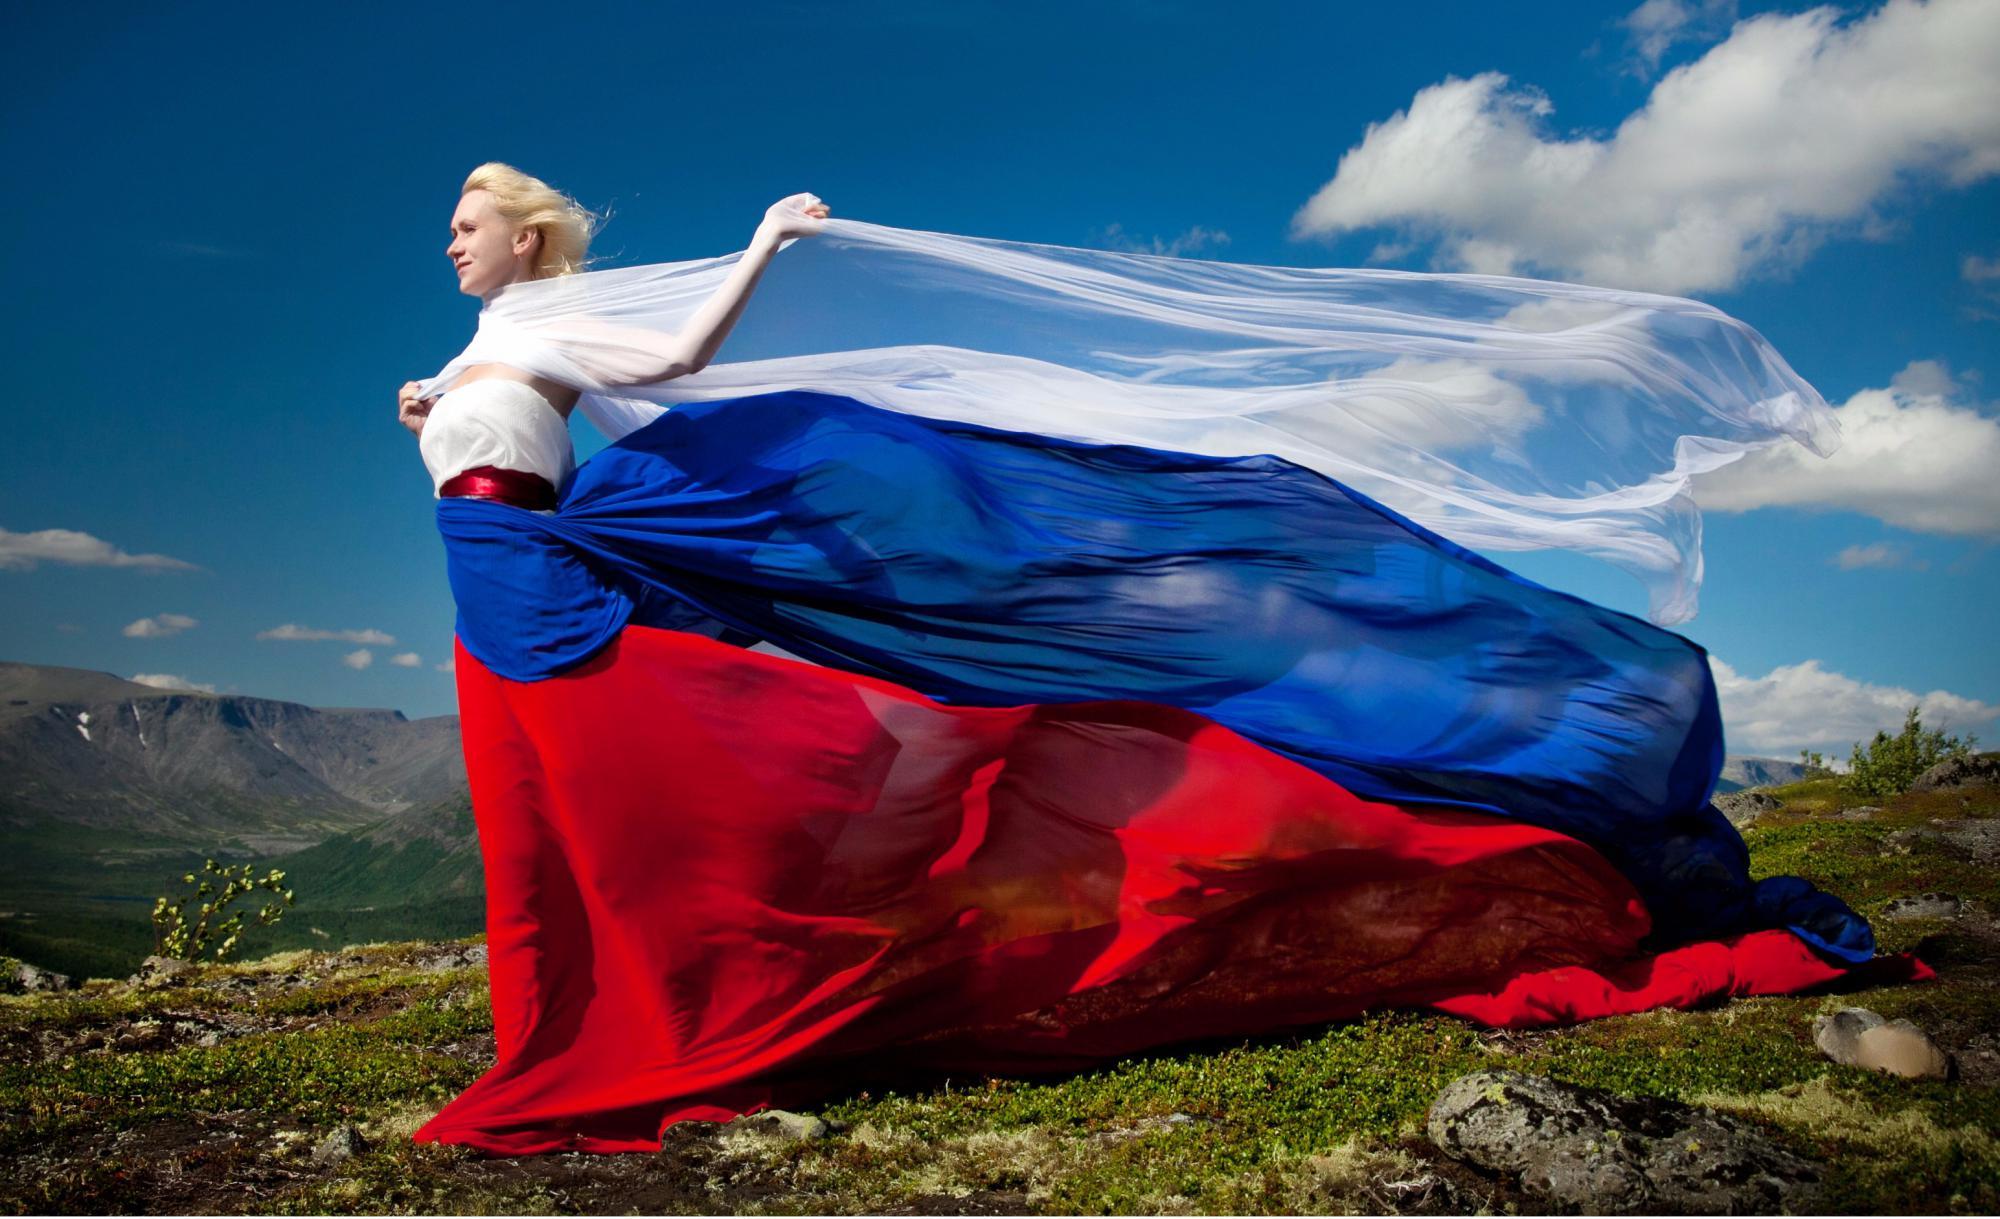 Картинки с темой патриотизма